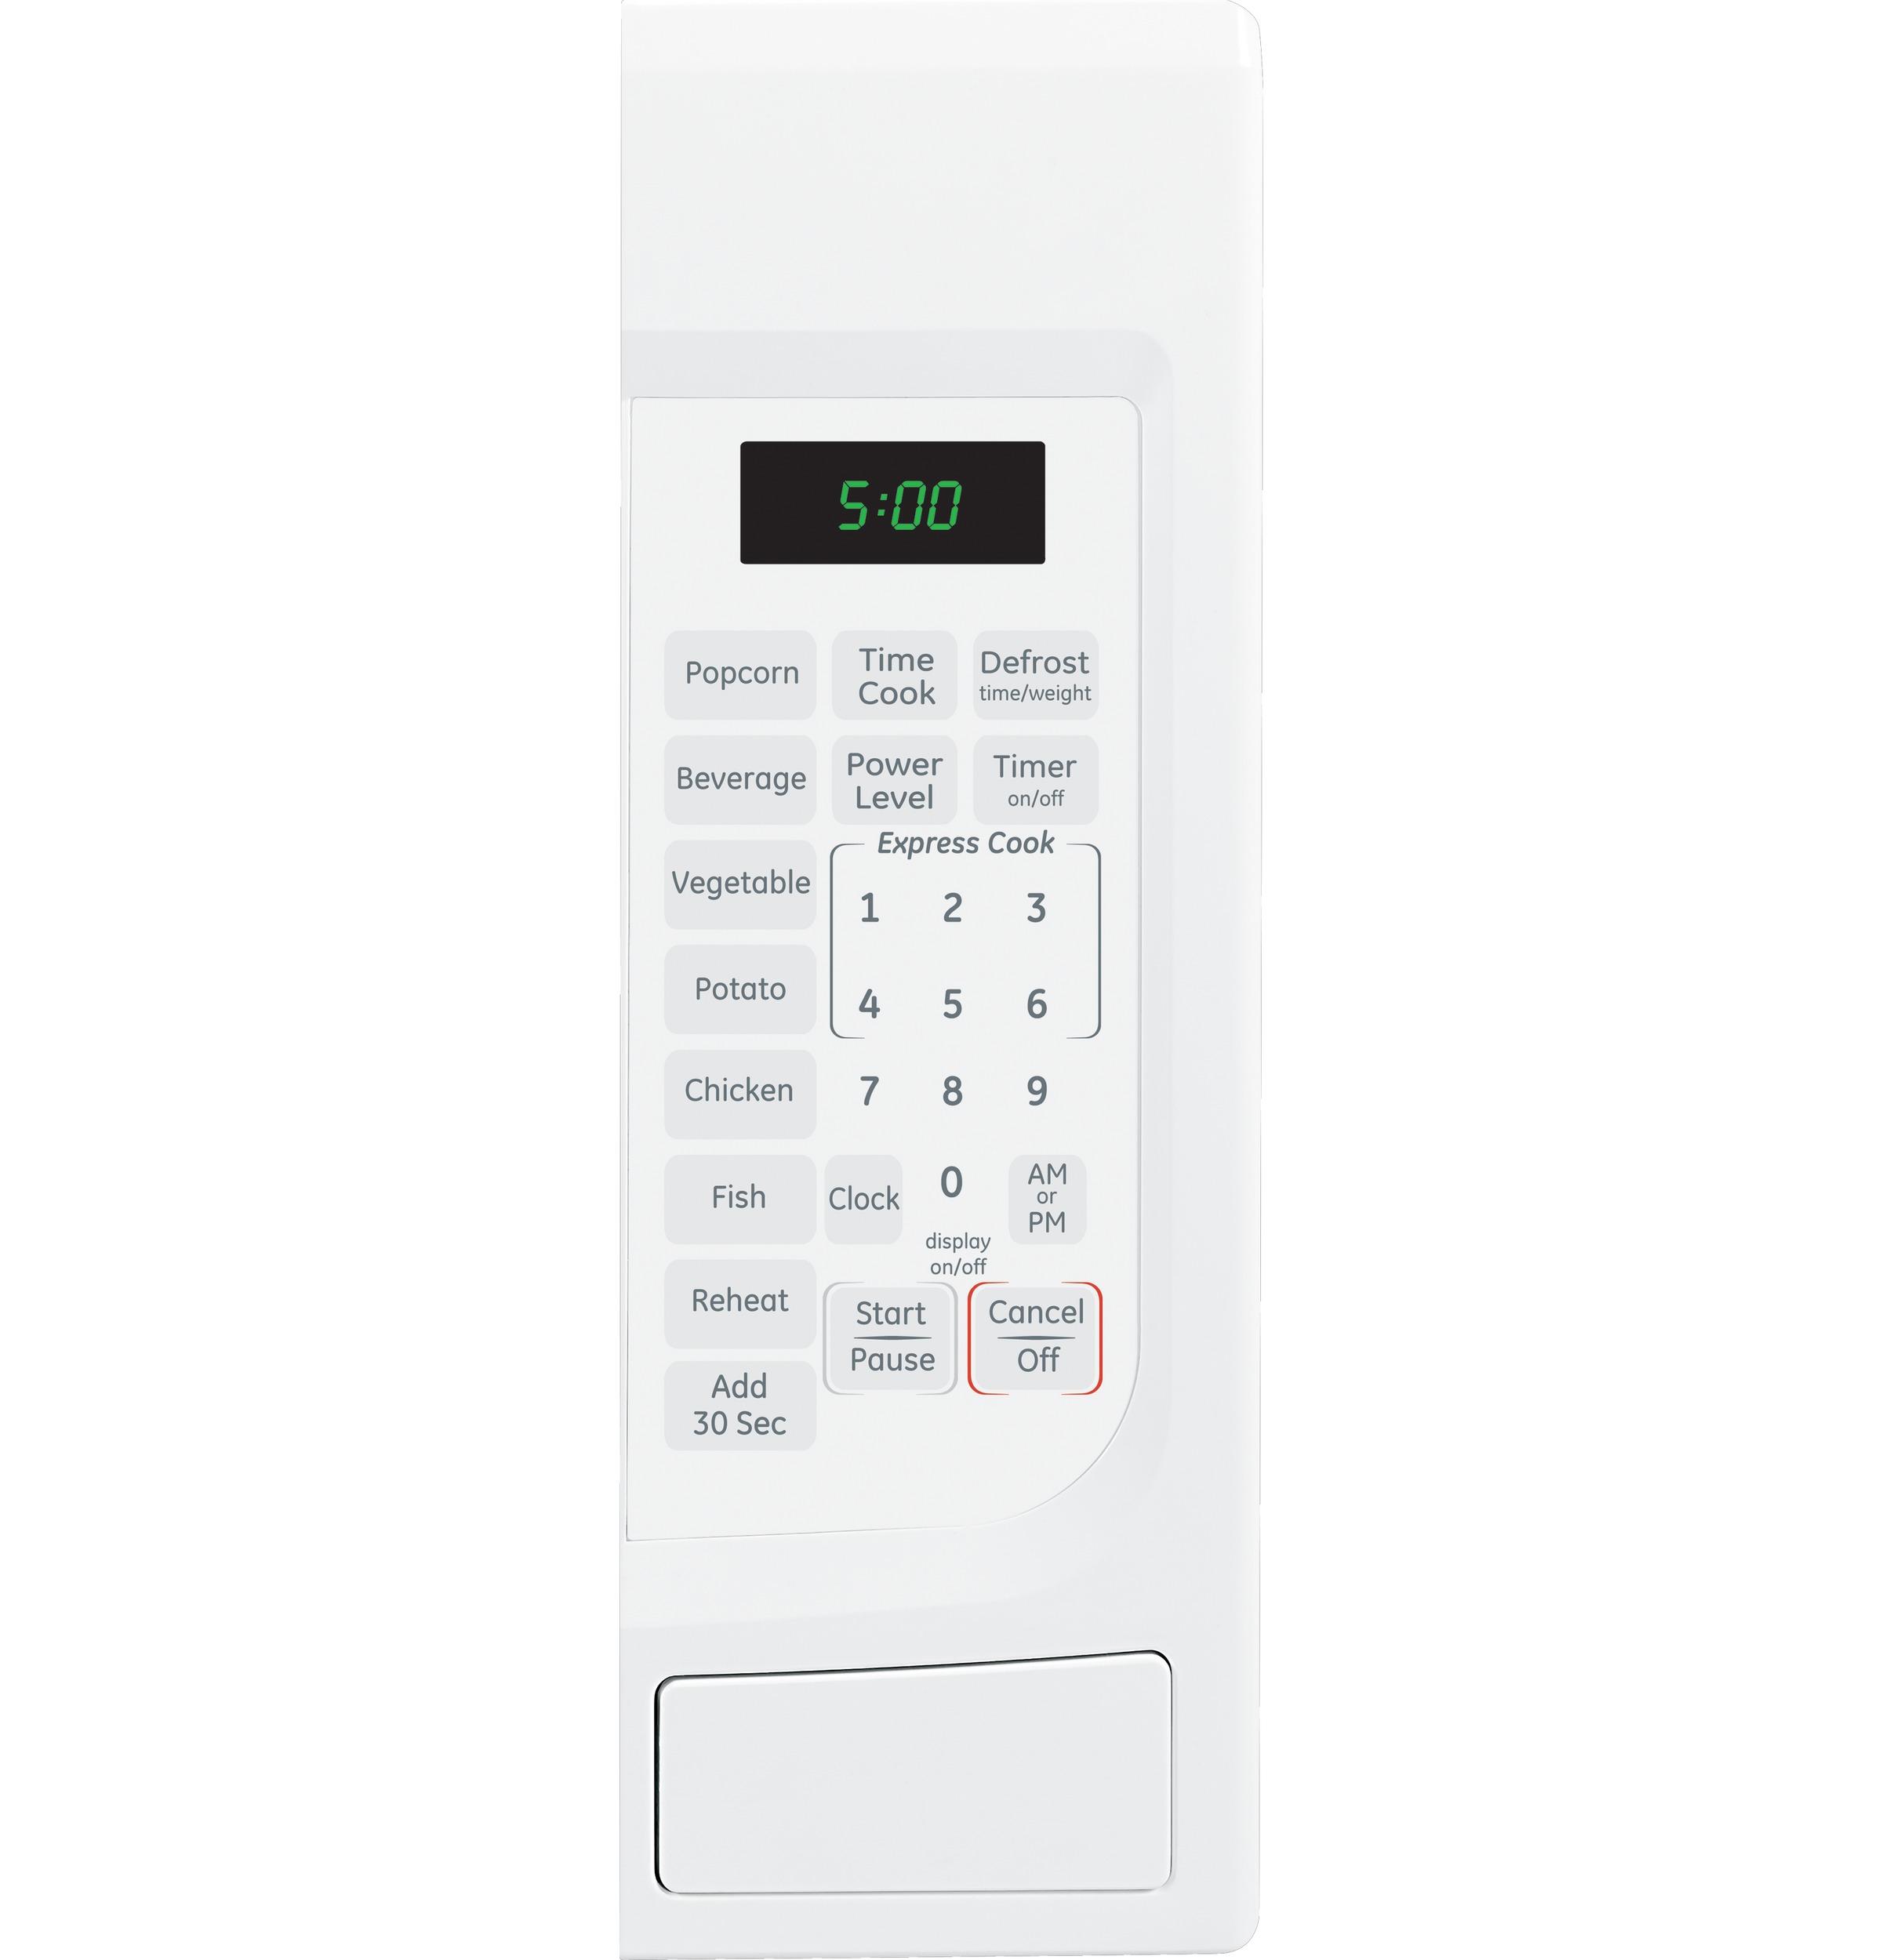 Model: JES1460DSWW | GE GE® 1.4 Cu. Ft. Countertop Microwave Oven